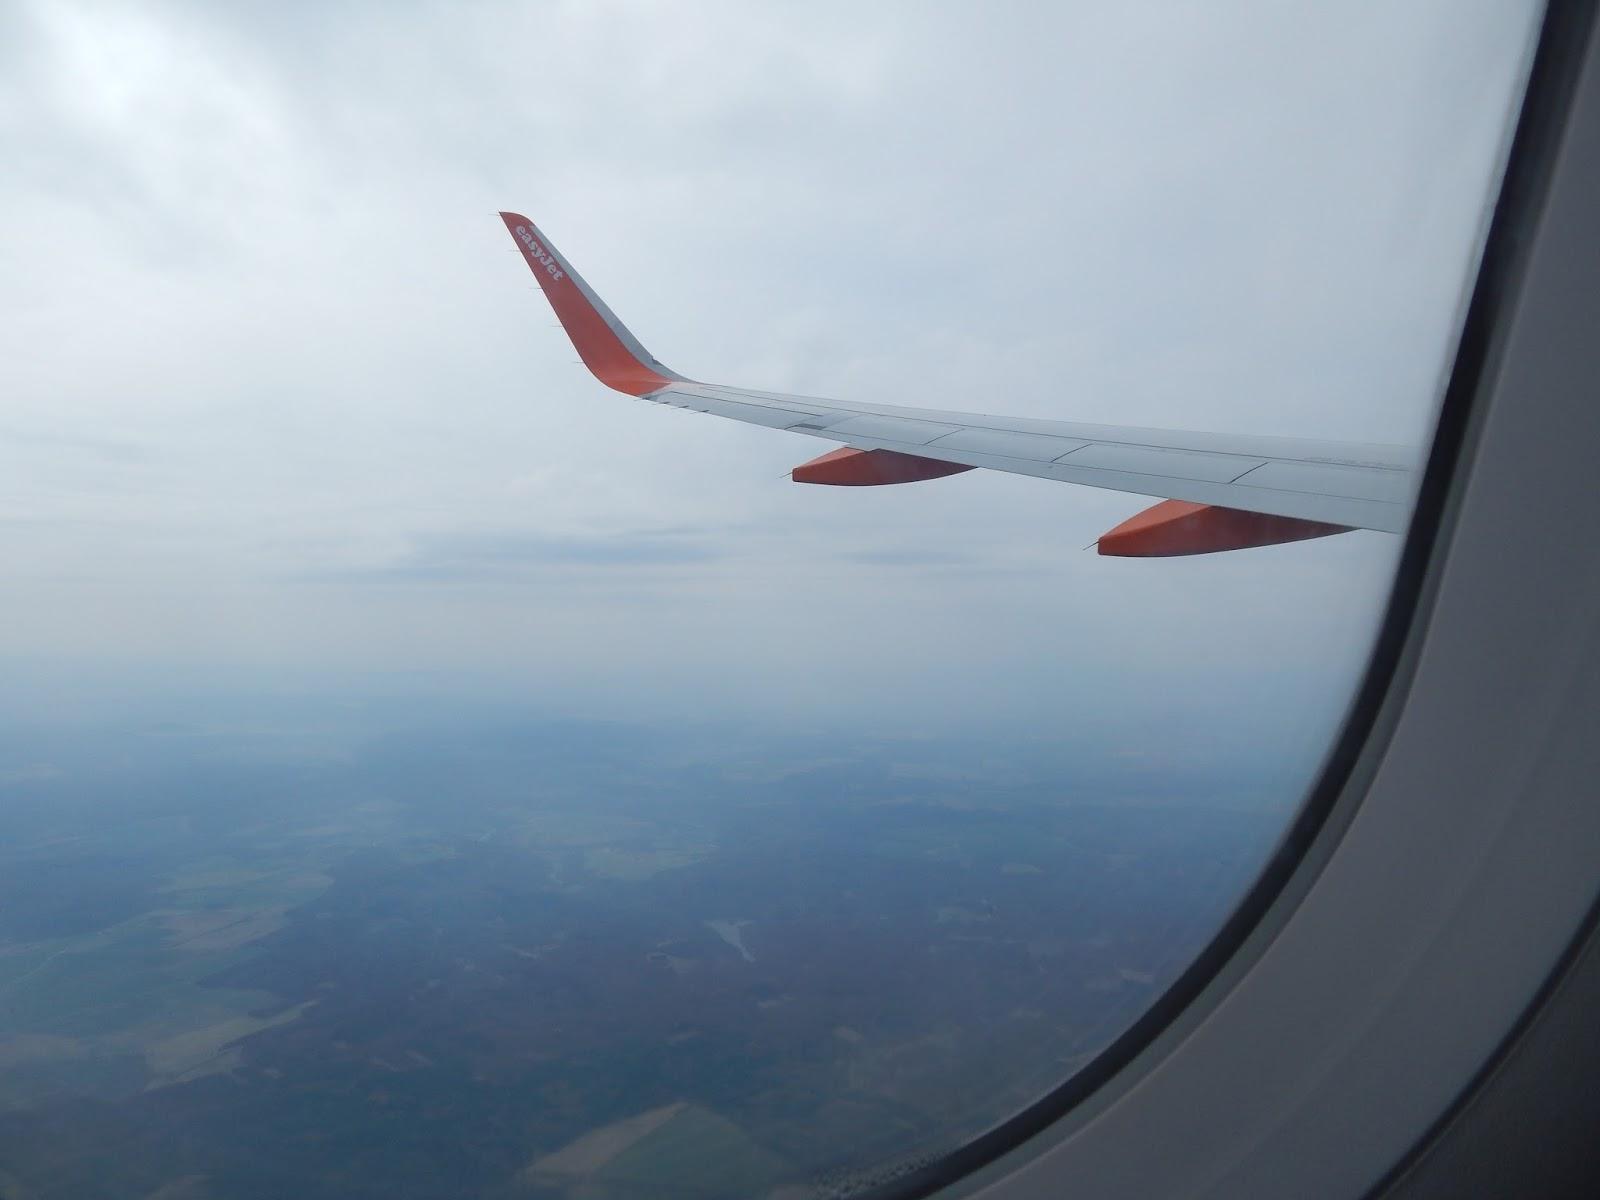 Cesta letadlem z ČR do Holandska